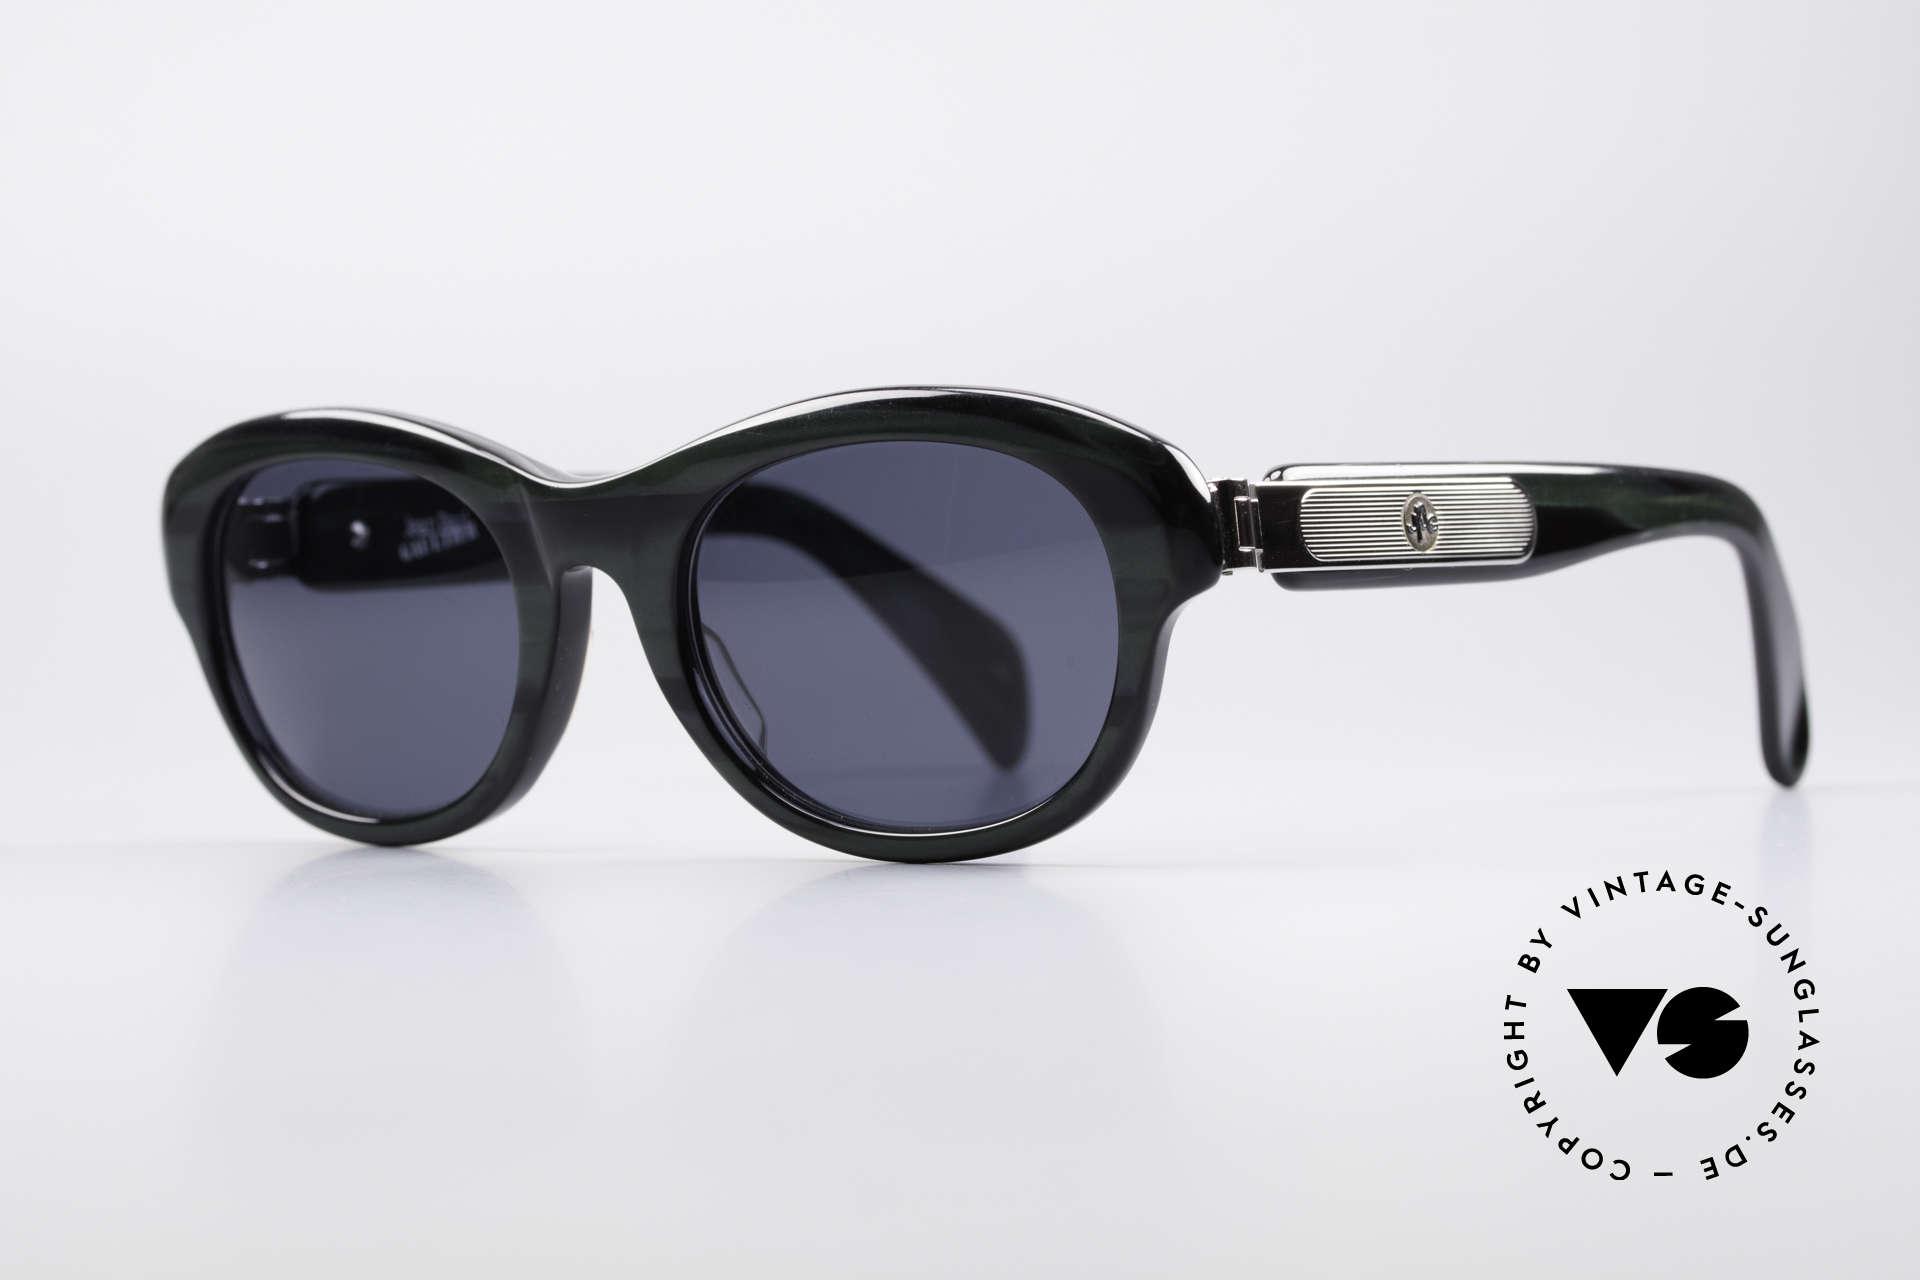 Jean Paul Gaultier 56-2071 True Vintage No Retro Brille, massiver Rahmen & markante Metall-Applikationen, Passend für Damen